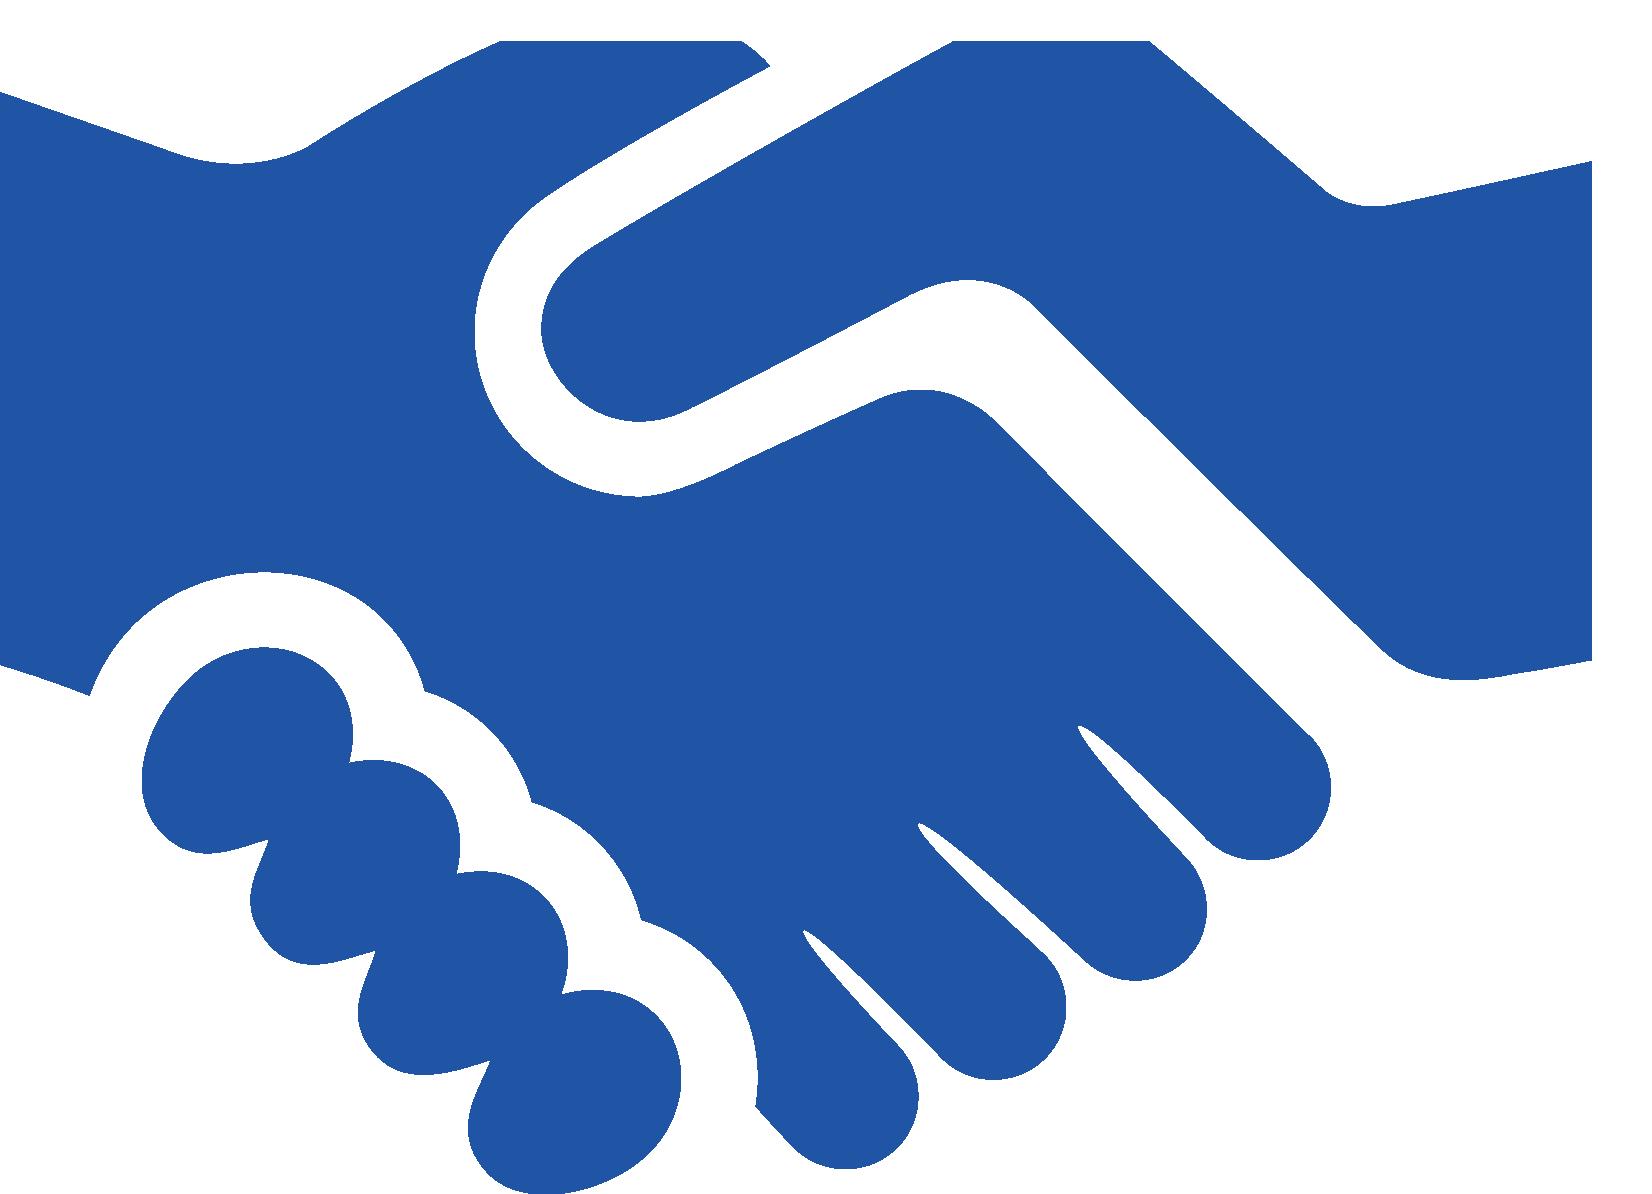 Shaking Hands | Pierce Group Benefits